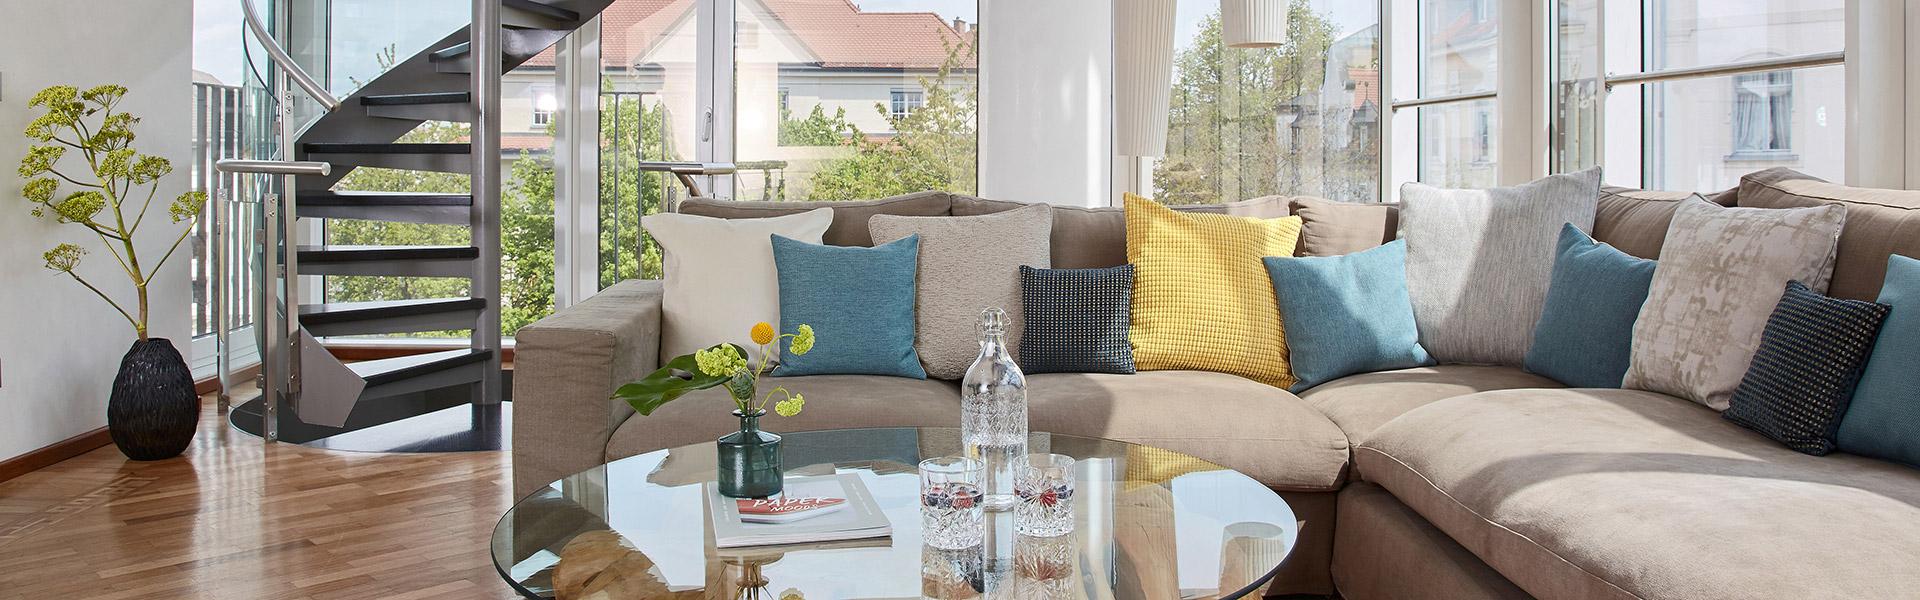 Living Hotel Prinzessin Elisabeth Muenchen Suite